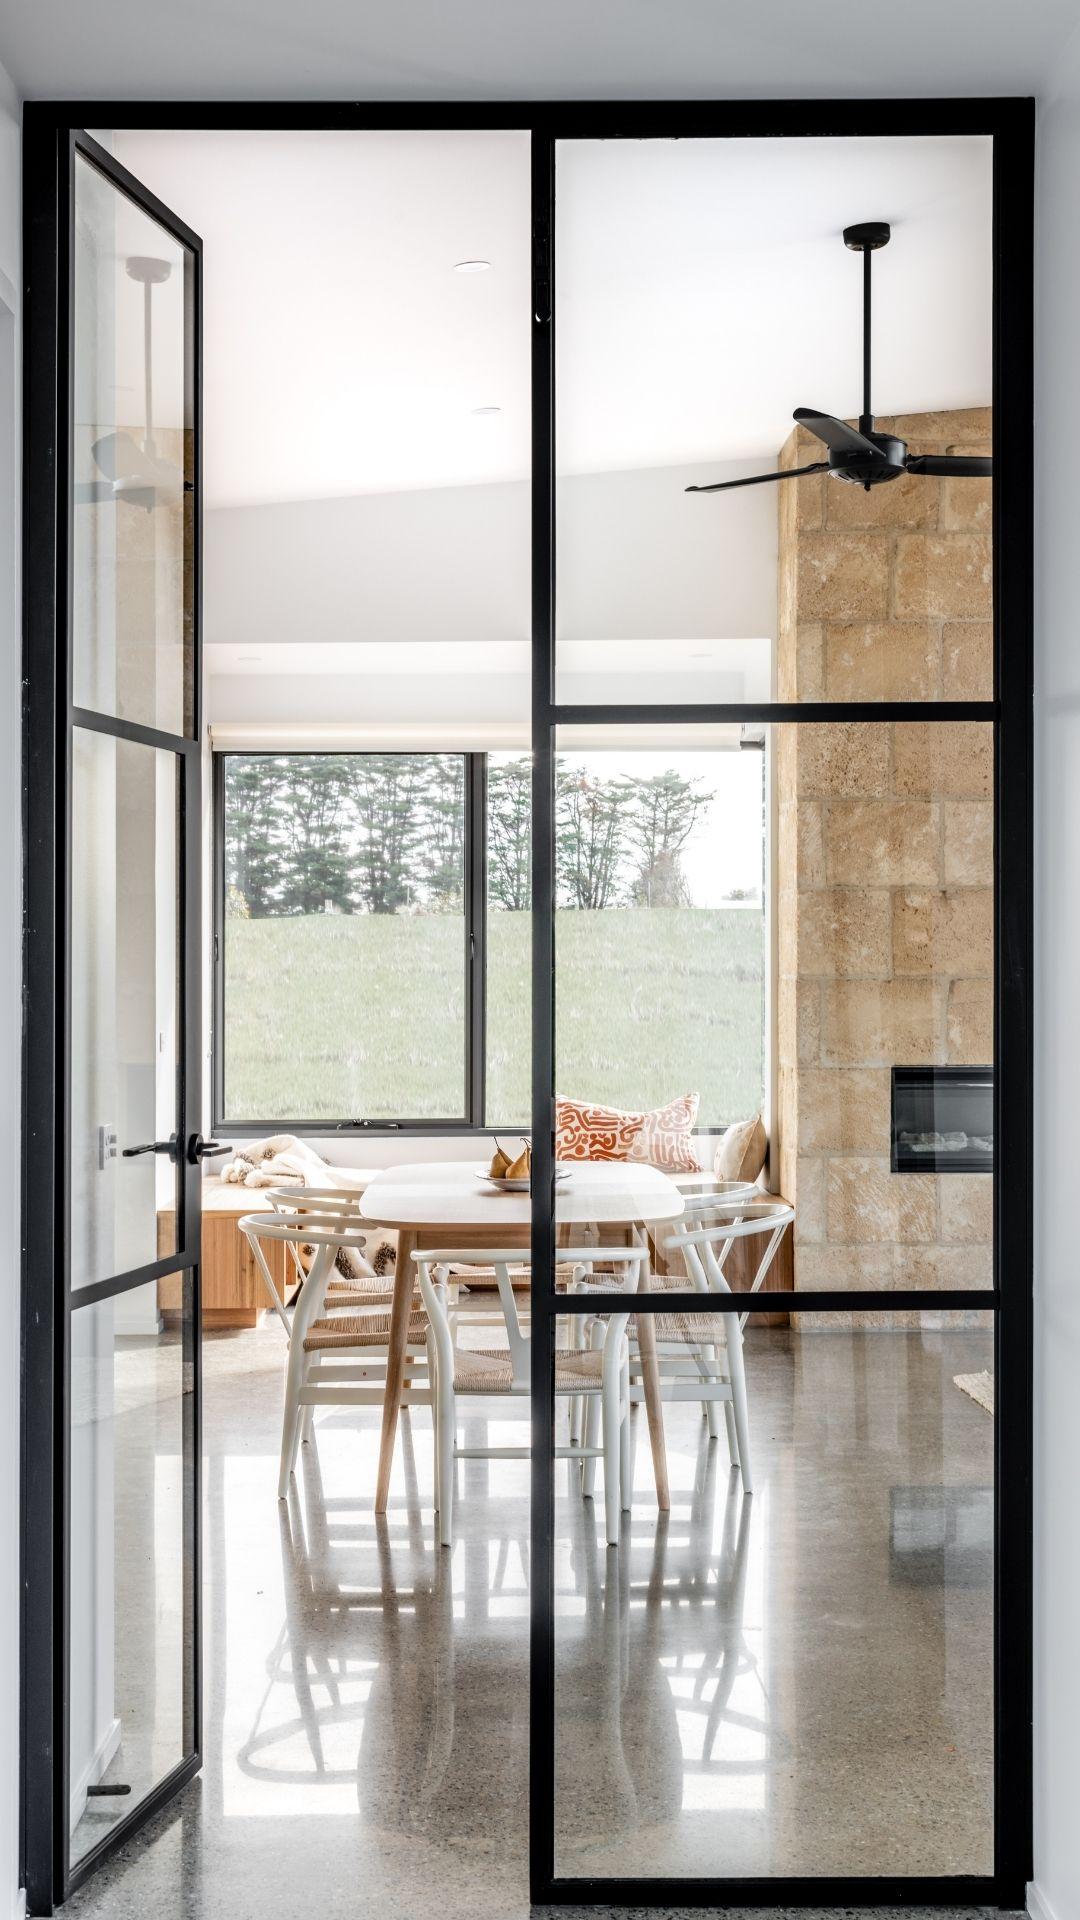 Belco Group Geelong Drafting Torquay Surcoast Sustainable Building Design Draftsman Passive House Torquay Barwon Heads Ocean Grove